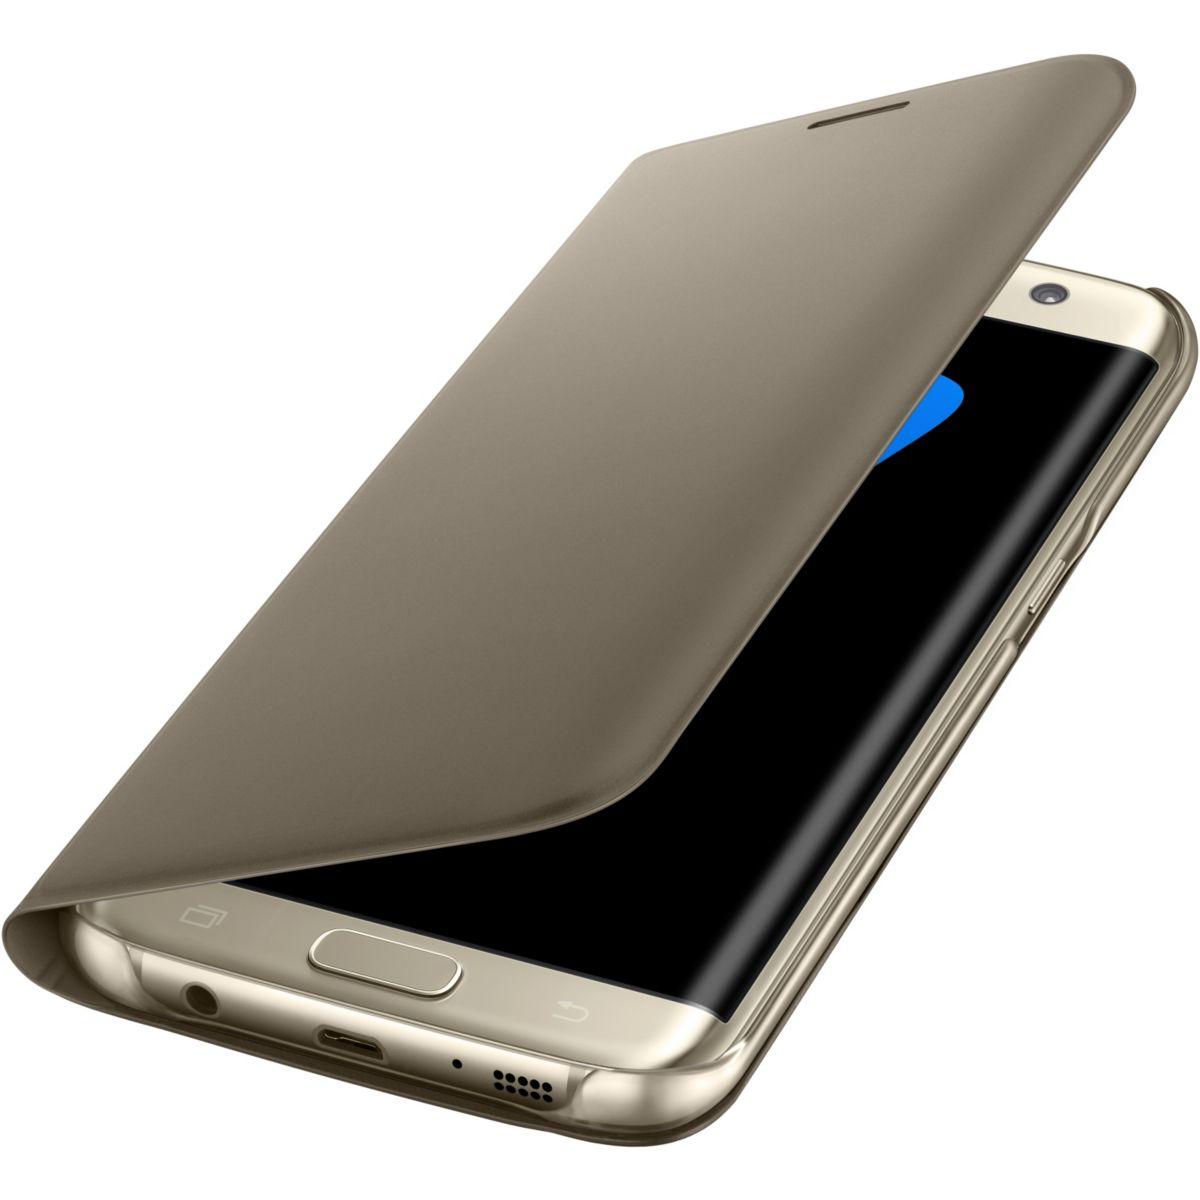 Etui samsung flip wallet galaxy s7 edge gold - livraison offerte : code liv